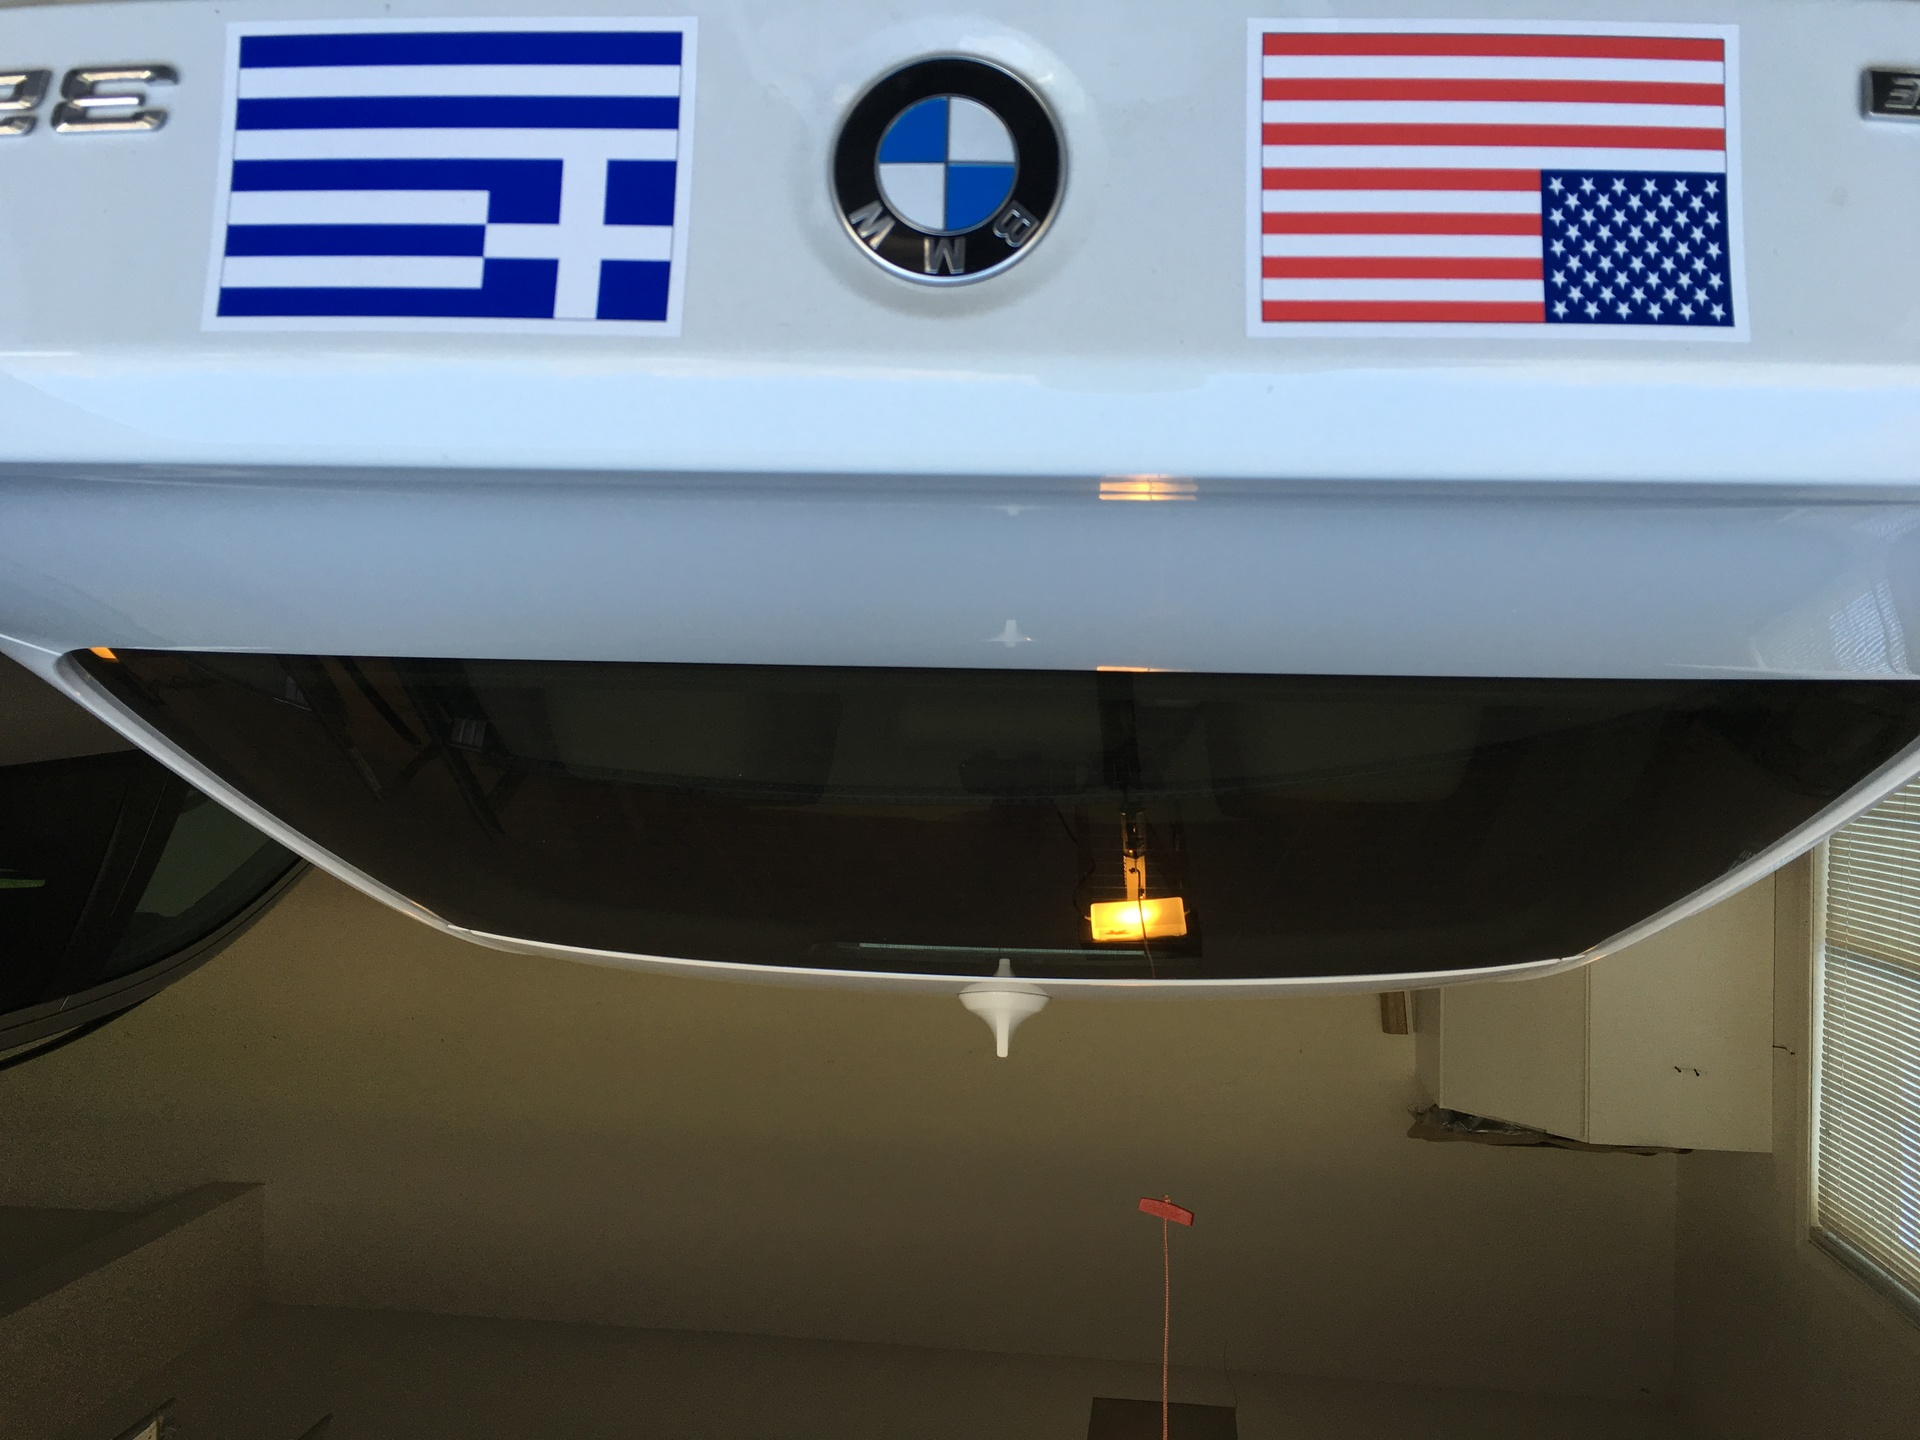 Stefanos's photograph of their Greece Flag Sticker